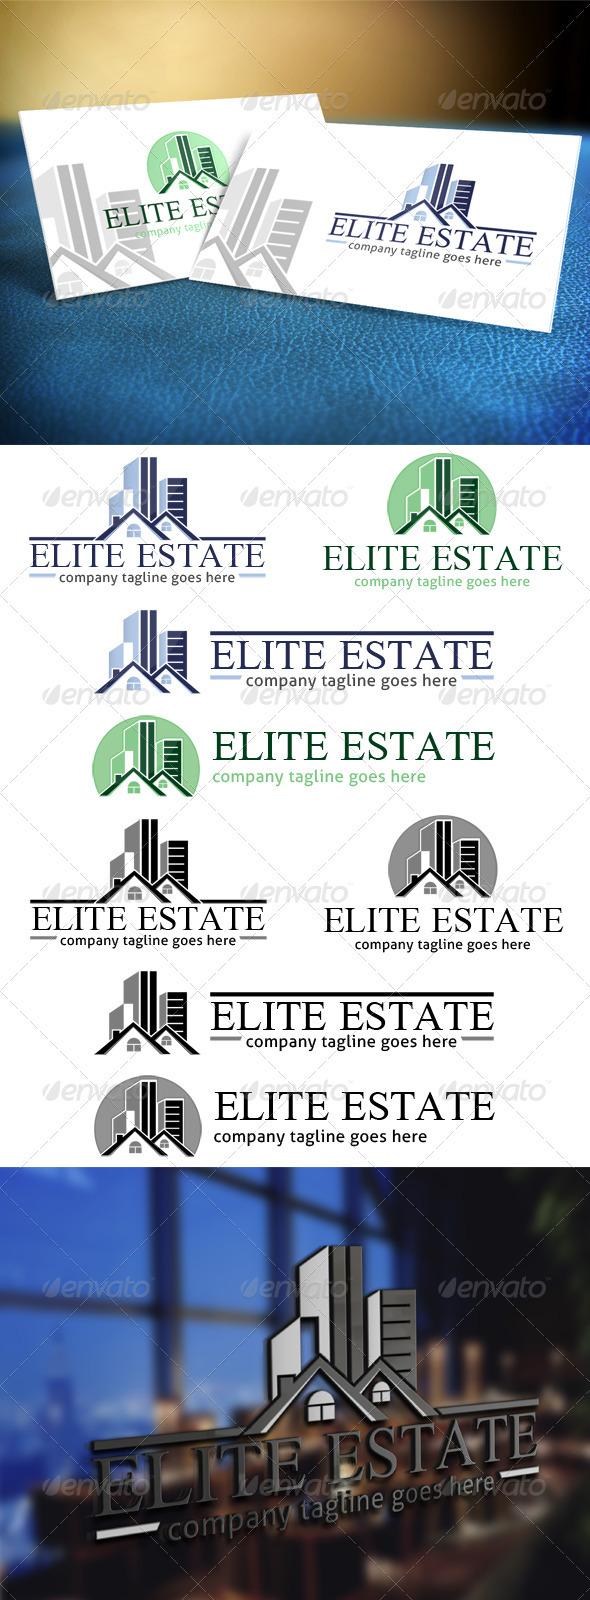 GraphicRiver Elite Estate Realty Logo 3783772